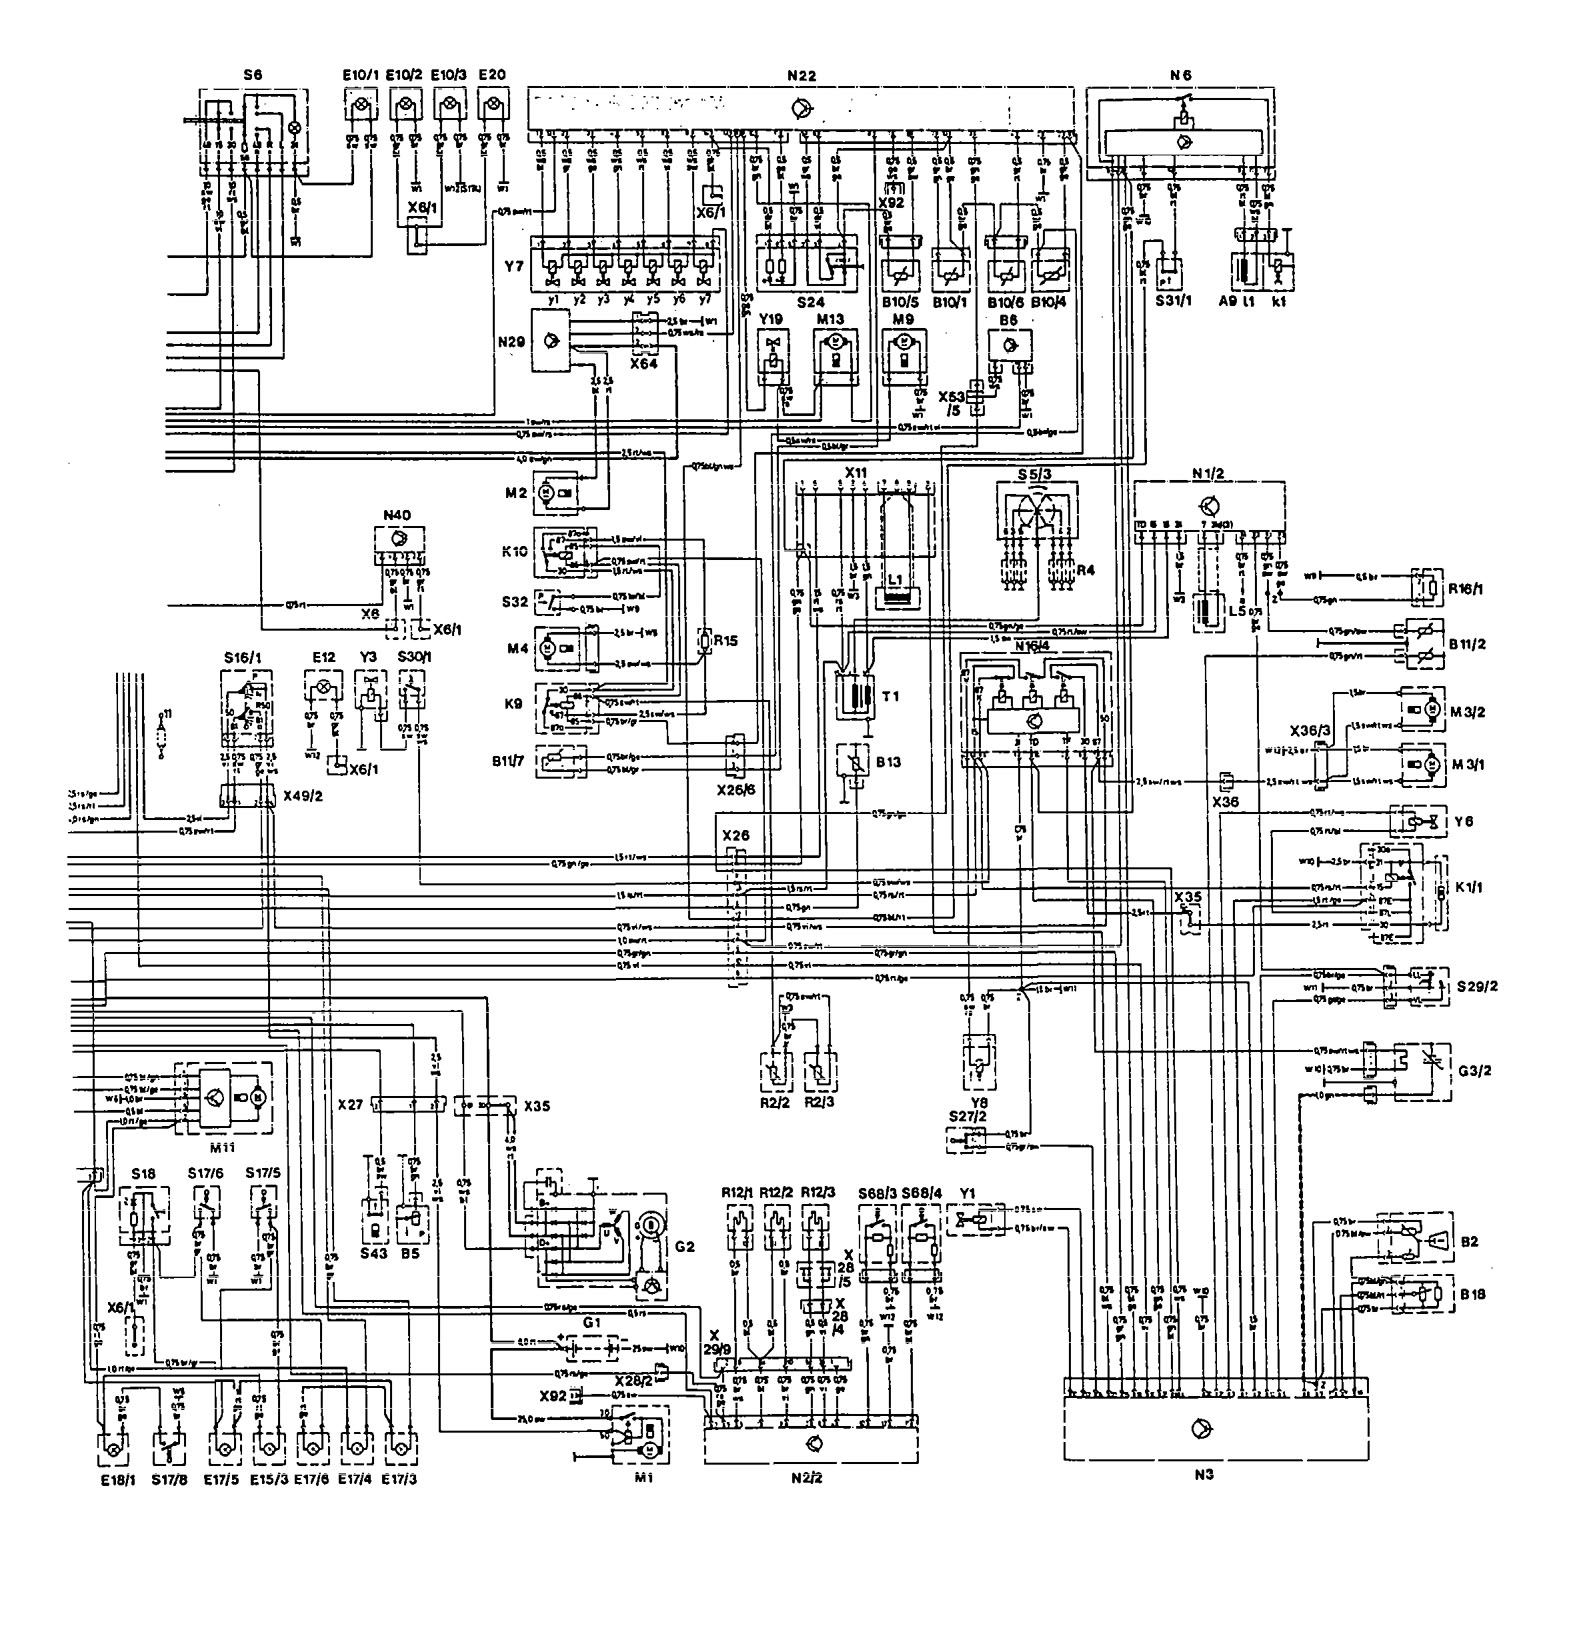 1993 Mercedes 300e Engine Diagram Electrical Wiring Diagrams Benz 500e 1992 Fuel Controls 500sl